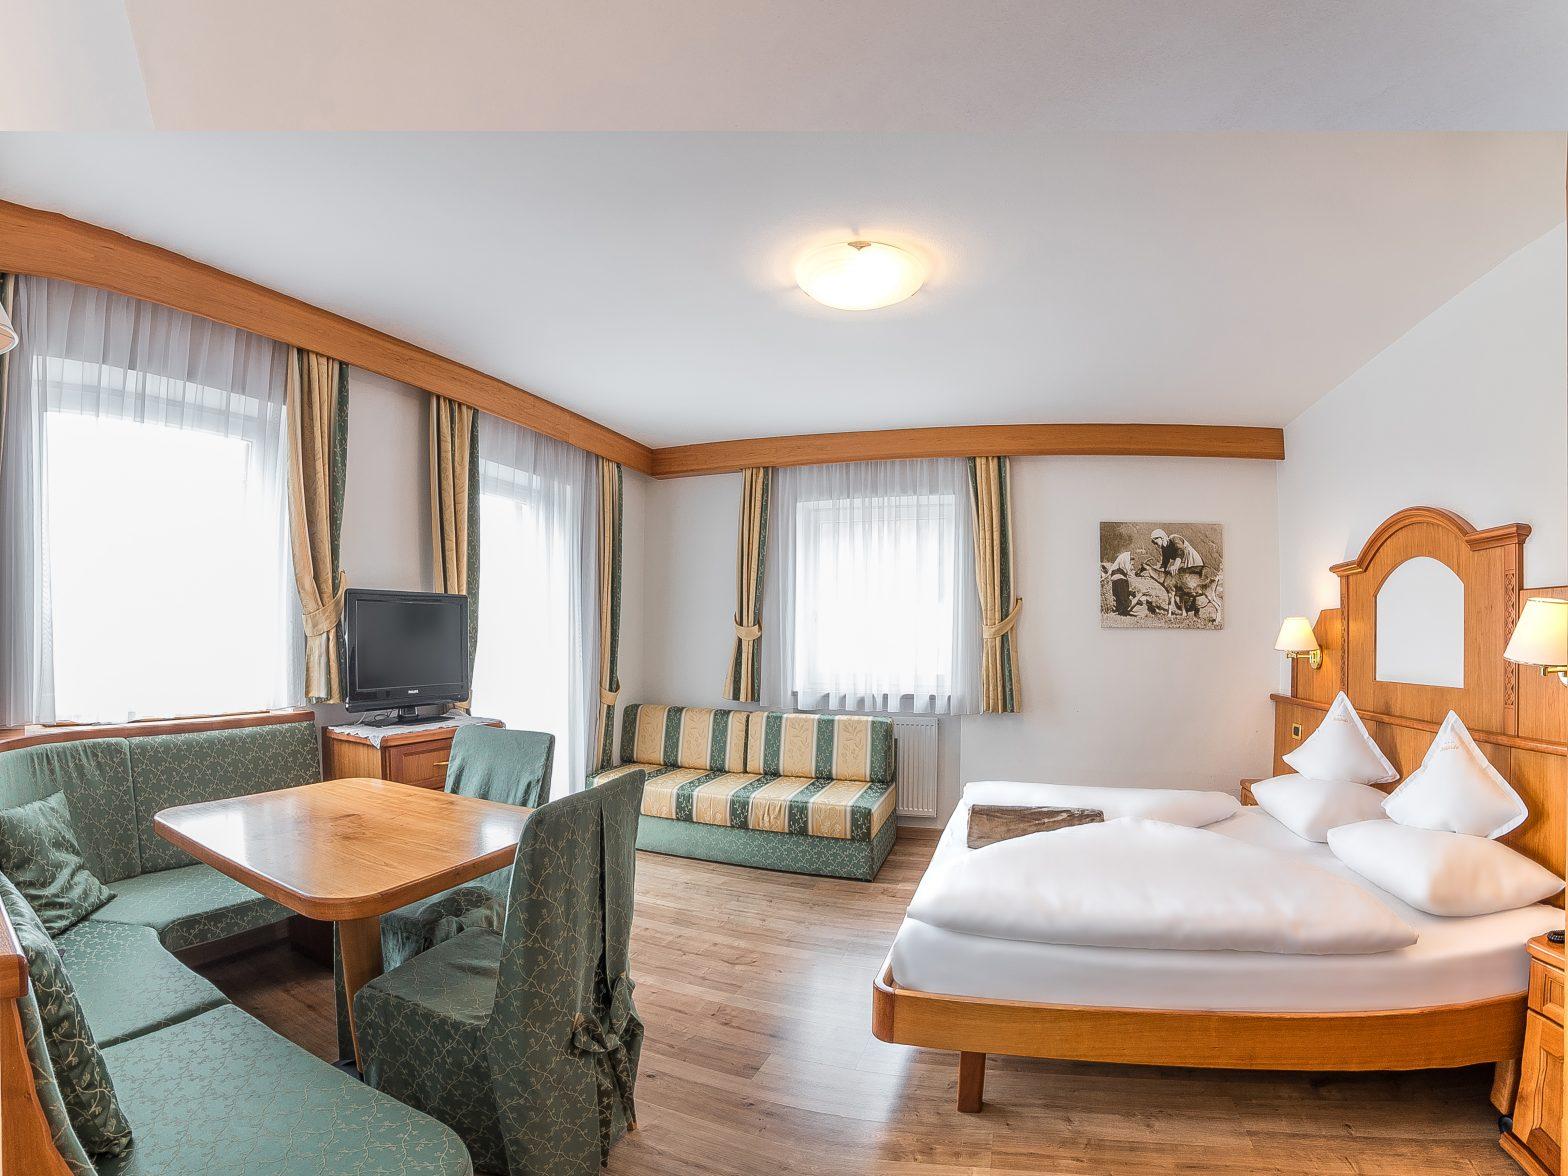 Hotel Scoiattolo Zimmer Neu-2(cut2)